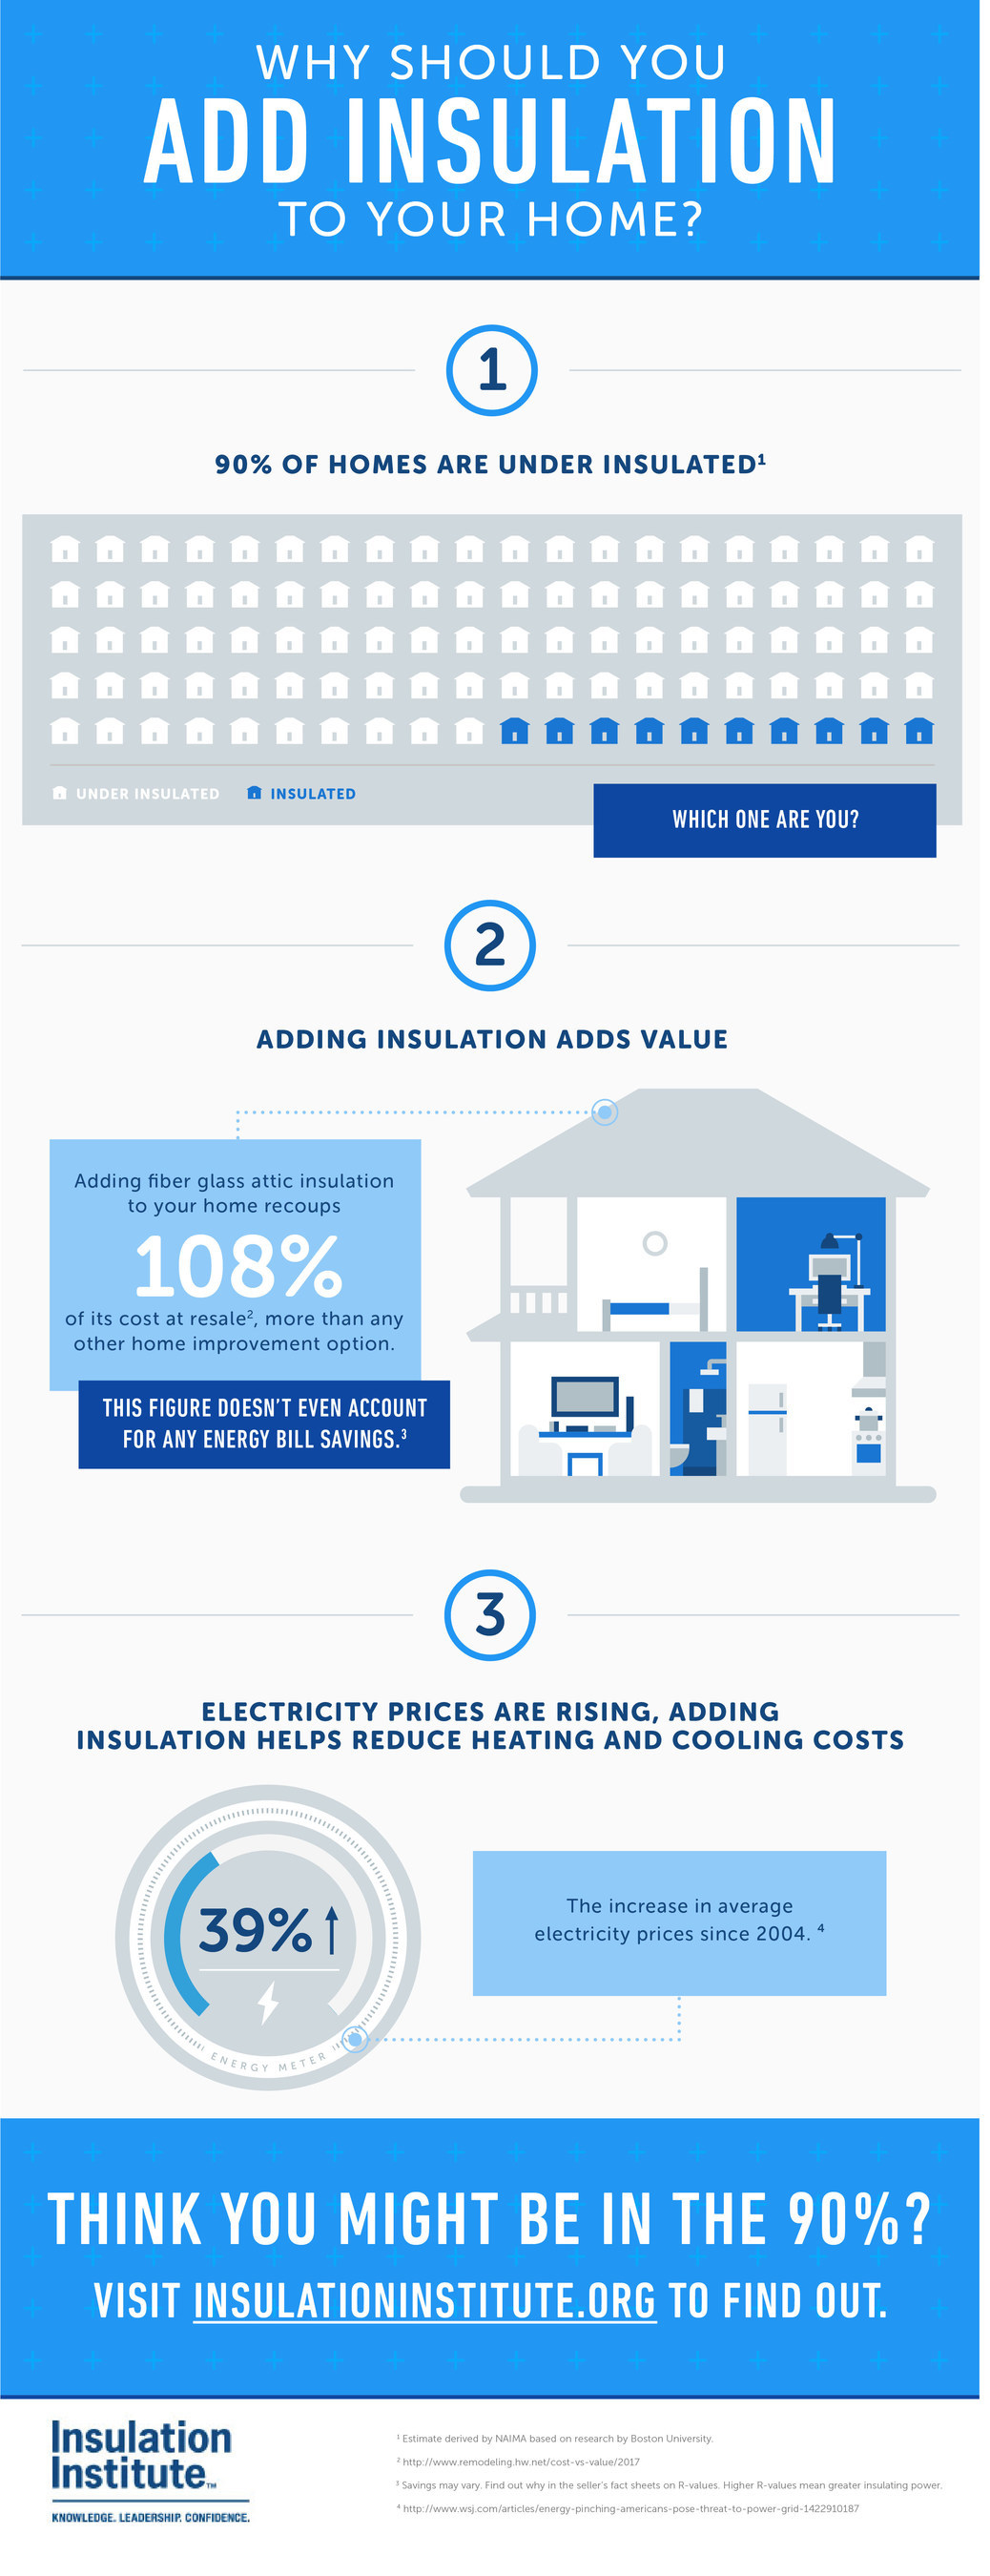 A fiberglass attic insulation upgrade pays.